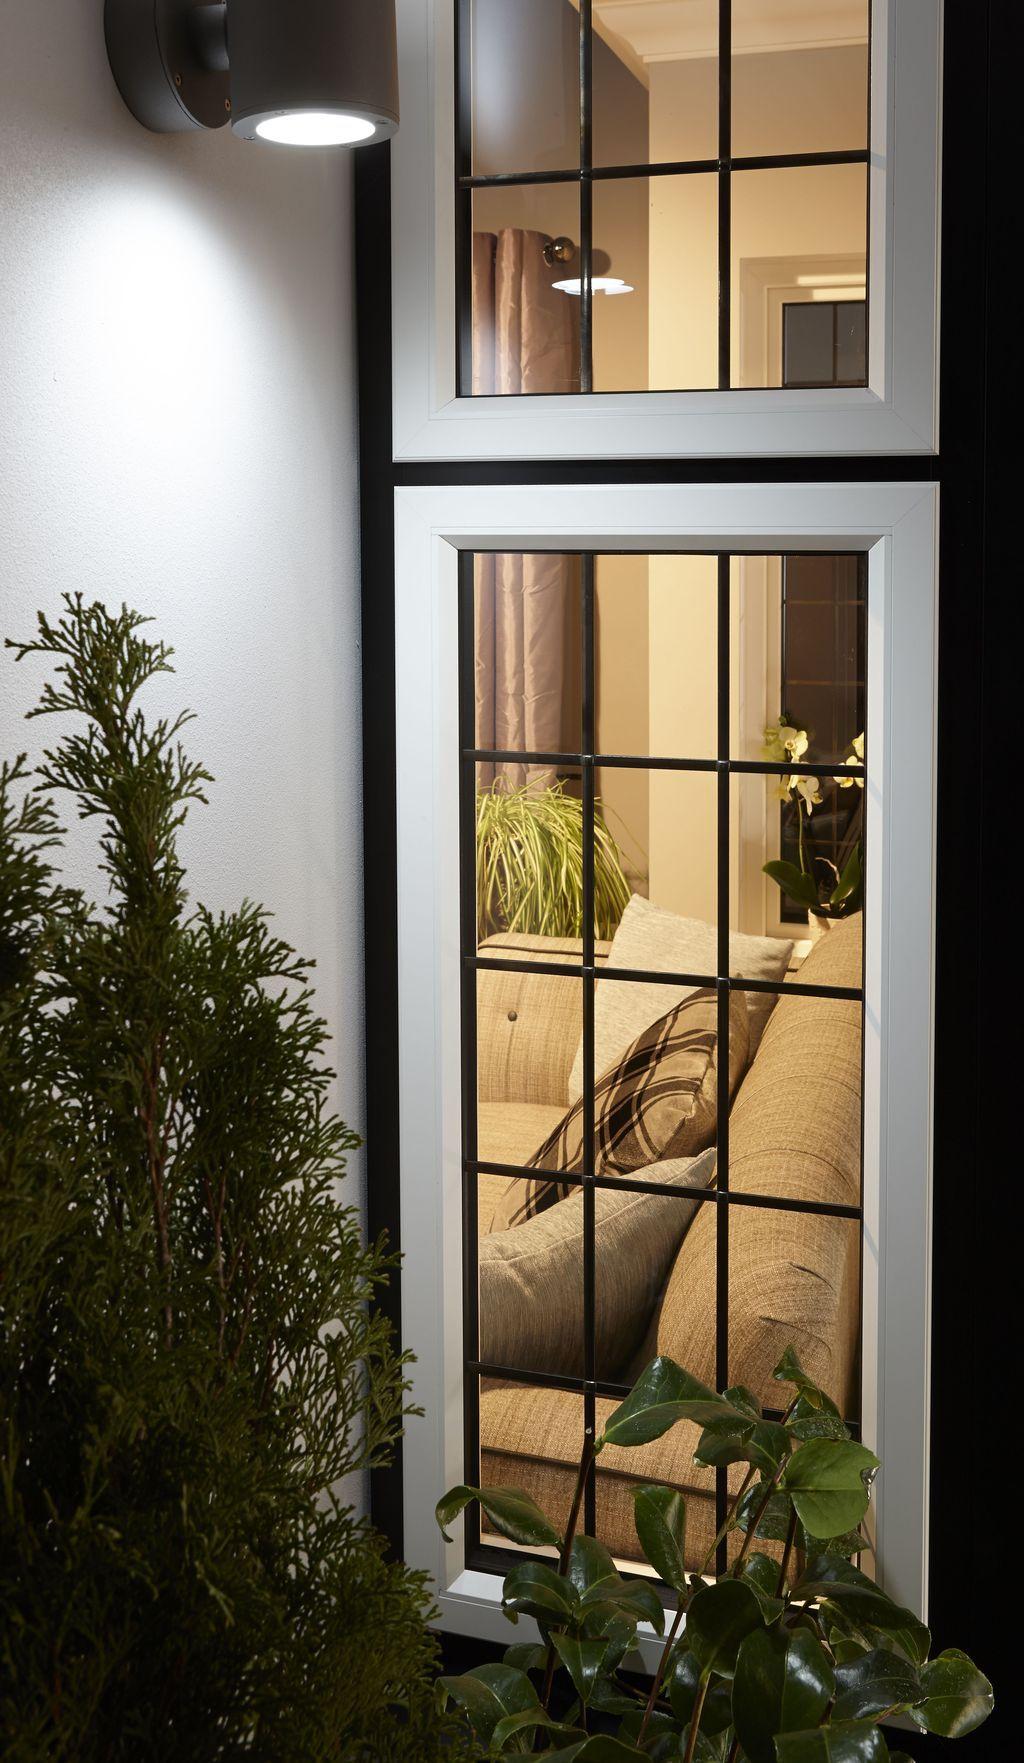 39 Minimalist Window Design Ideas For Your House Minimalist Window Window Design Window Grill Design Modern